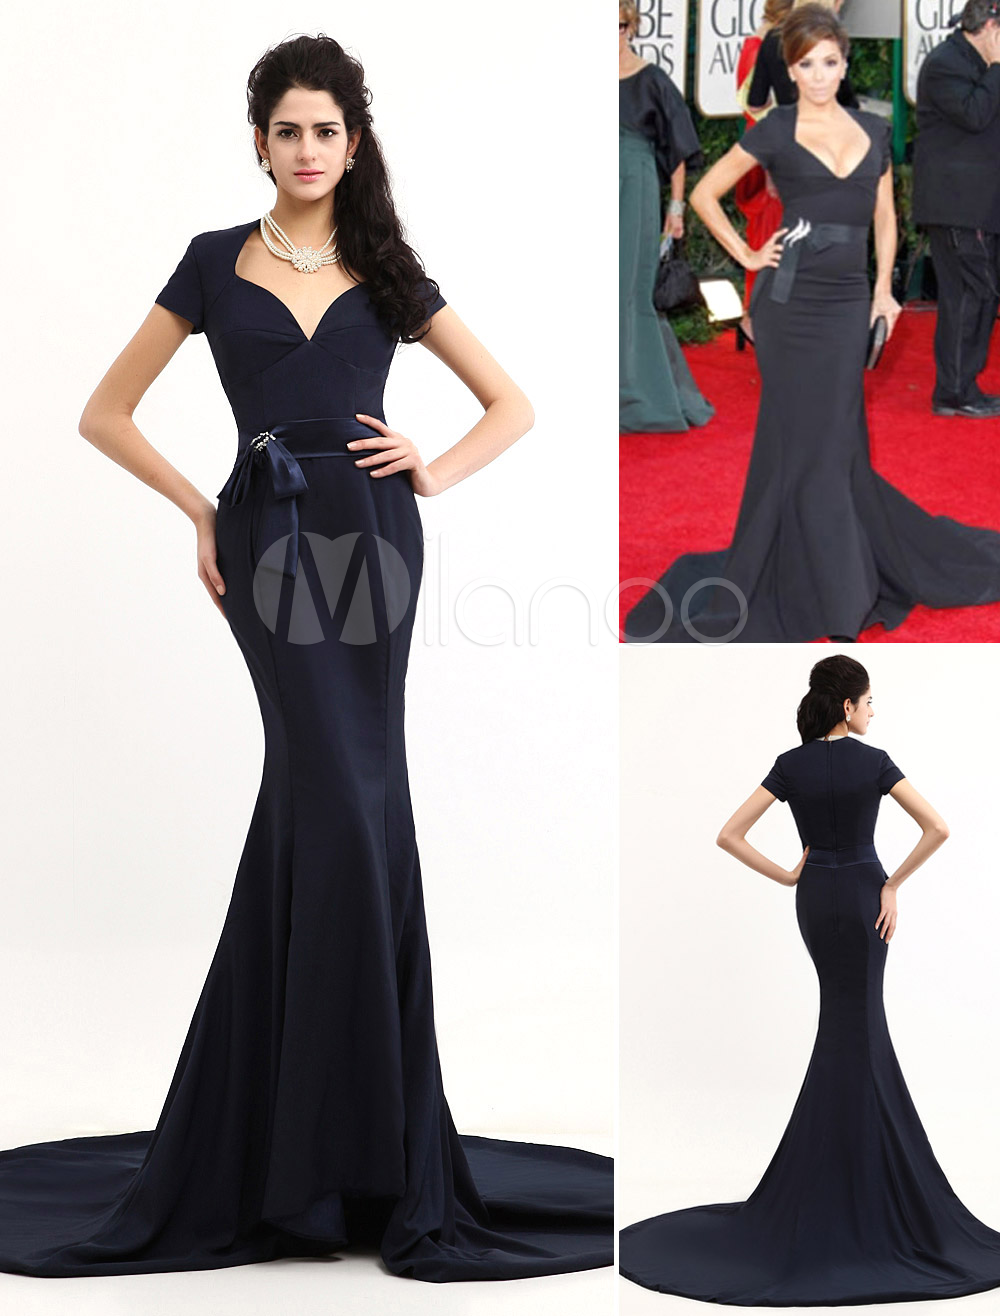 Celebrity Dress Dark Navy Satin Evening Dress Short Sleeve V Neck Beaded Oscar Dress